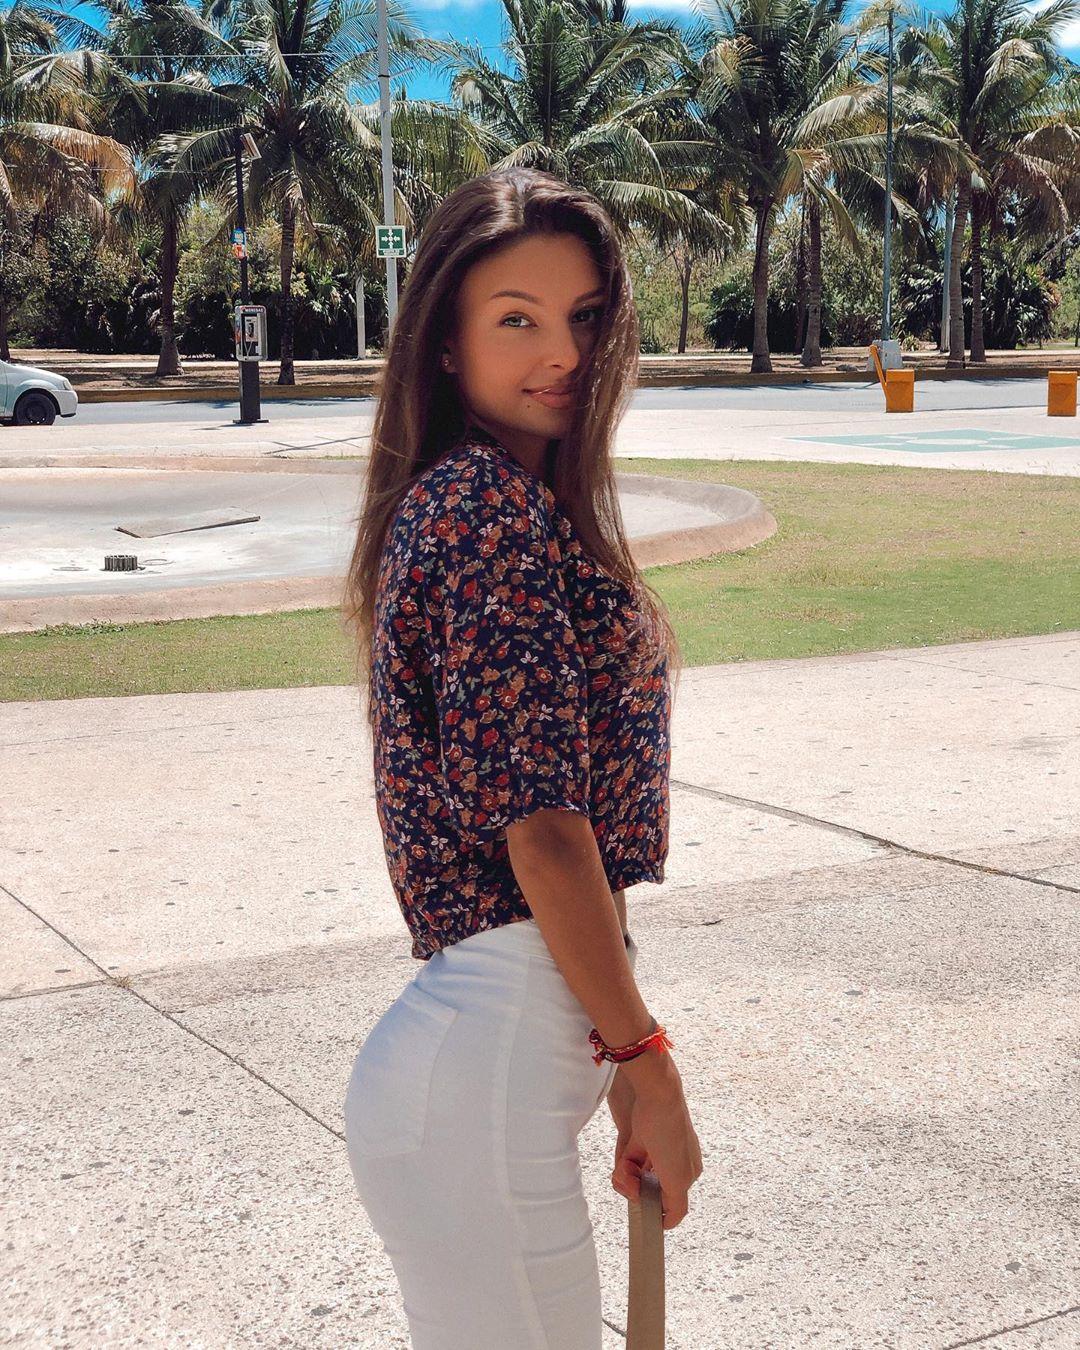 Alina-Brady-Wallpapers-Insta-Biography-7